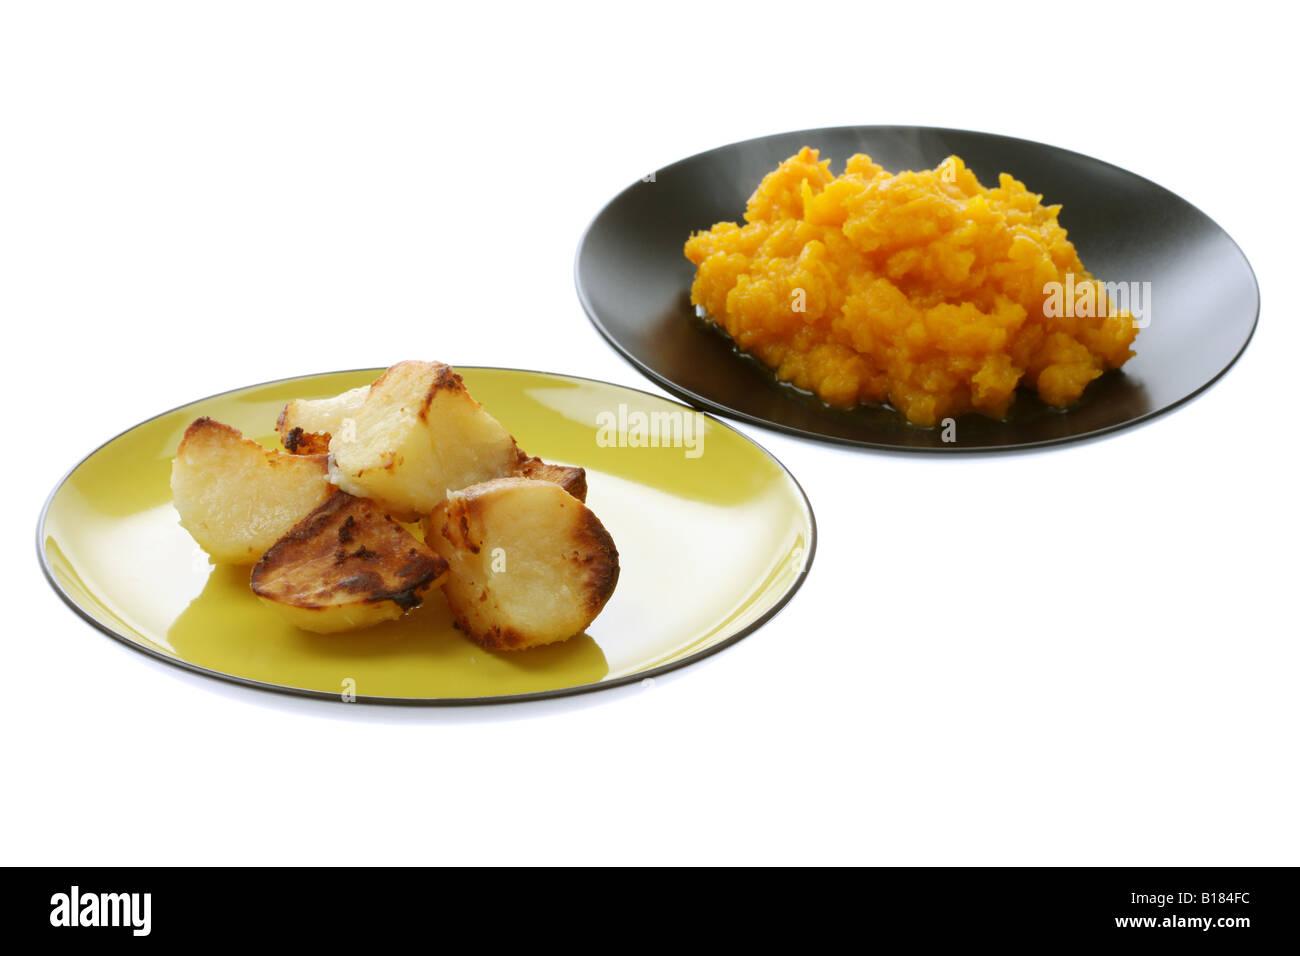 Roast Potatoes and Mashed Butternut Squash - Stock Image